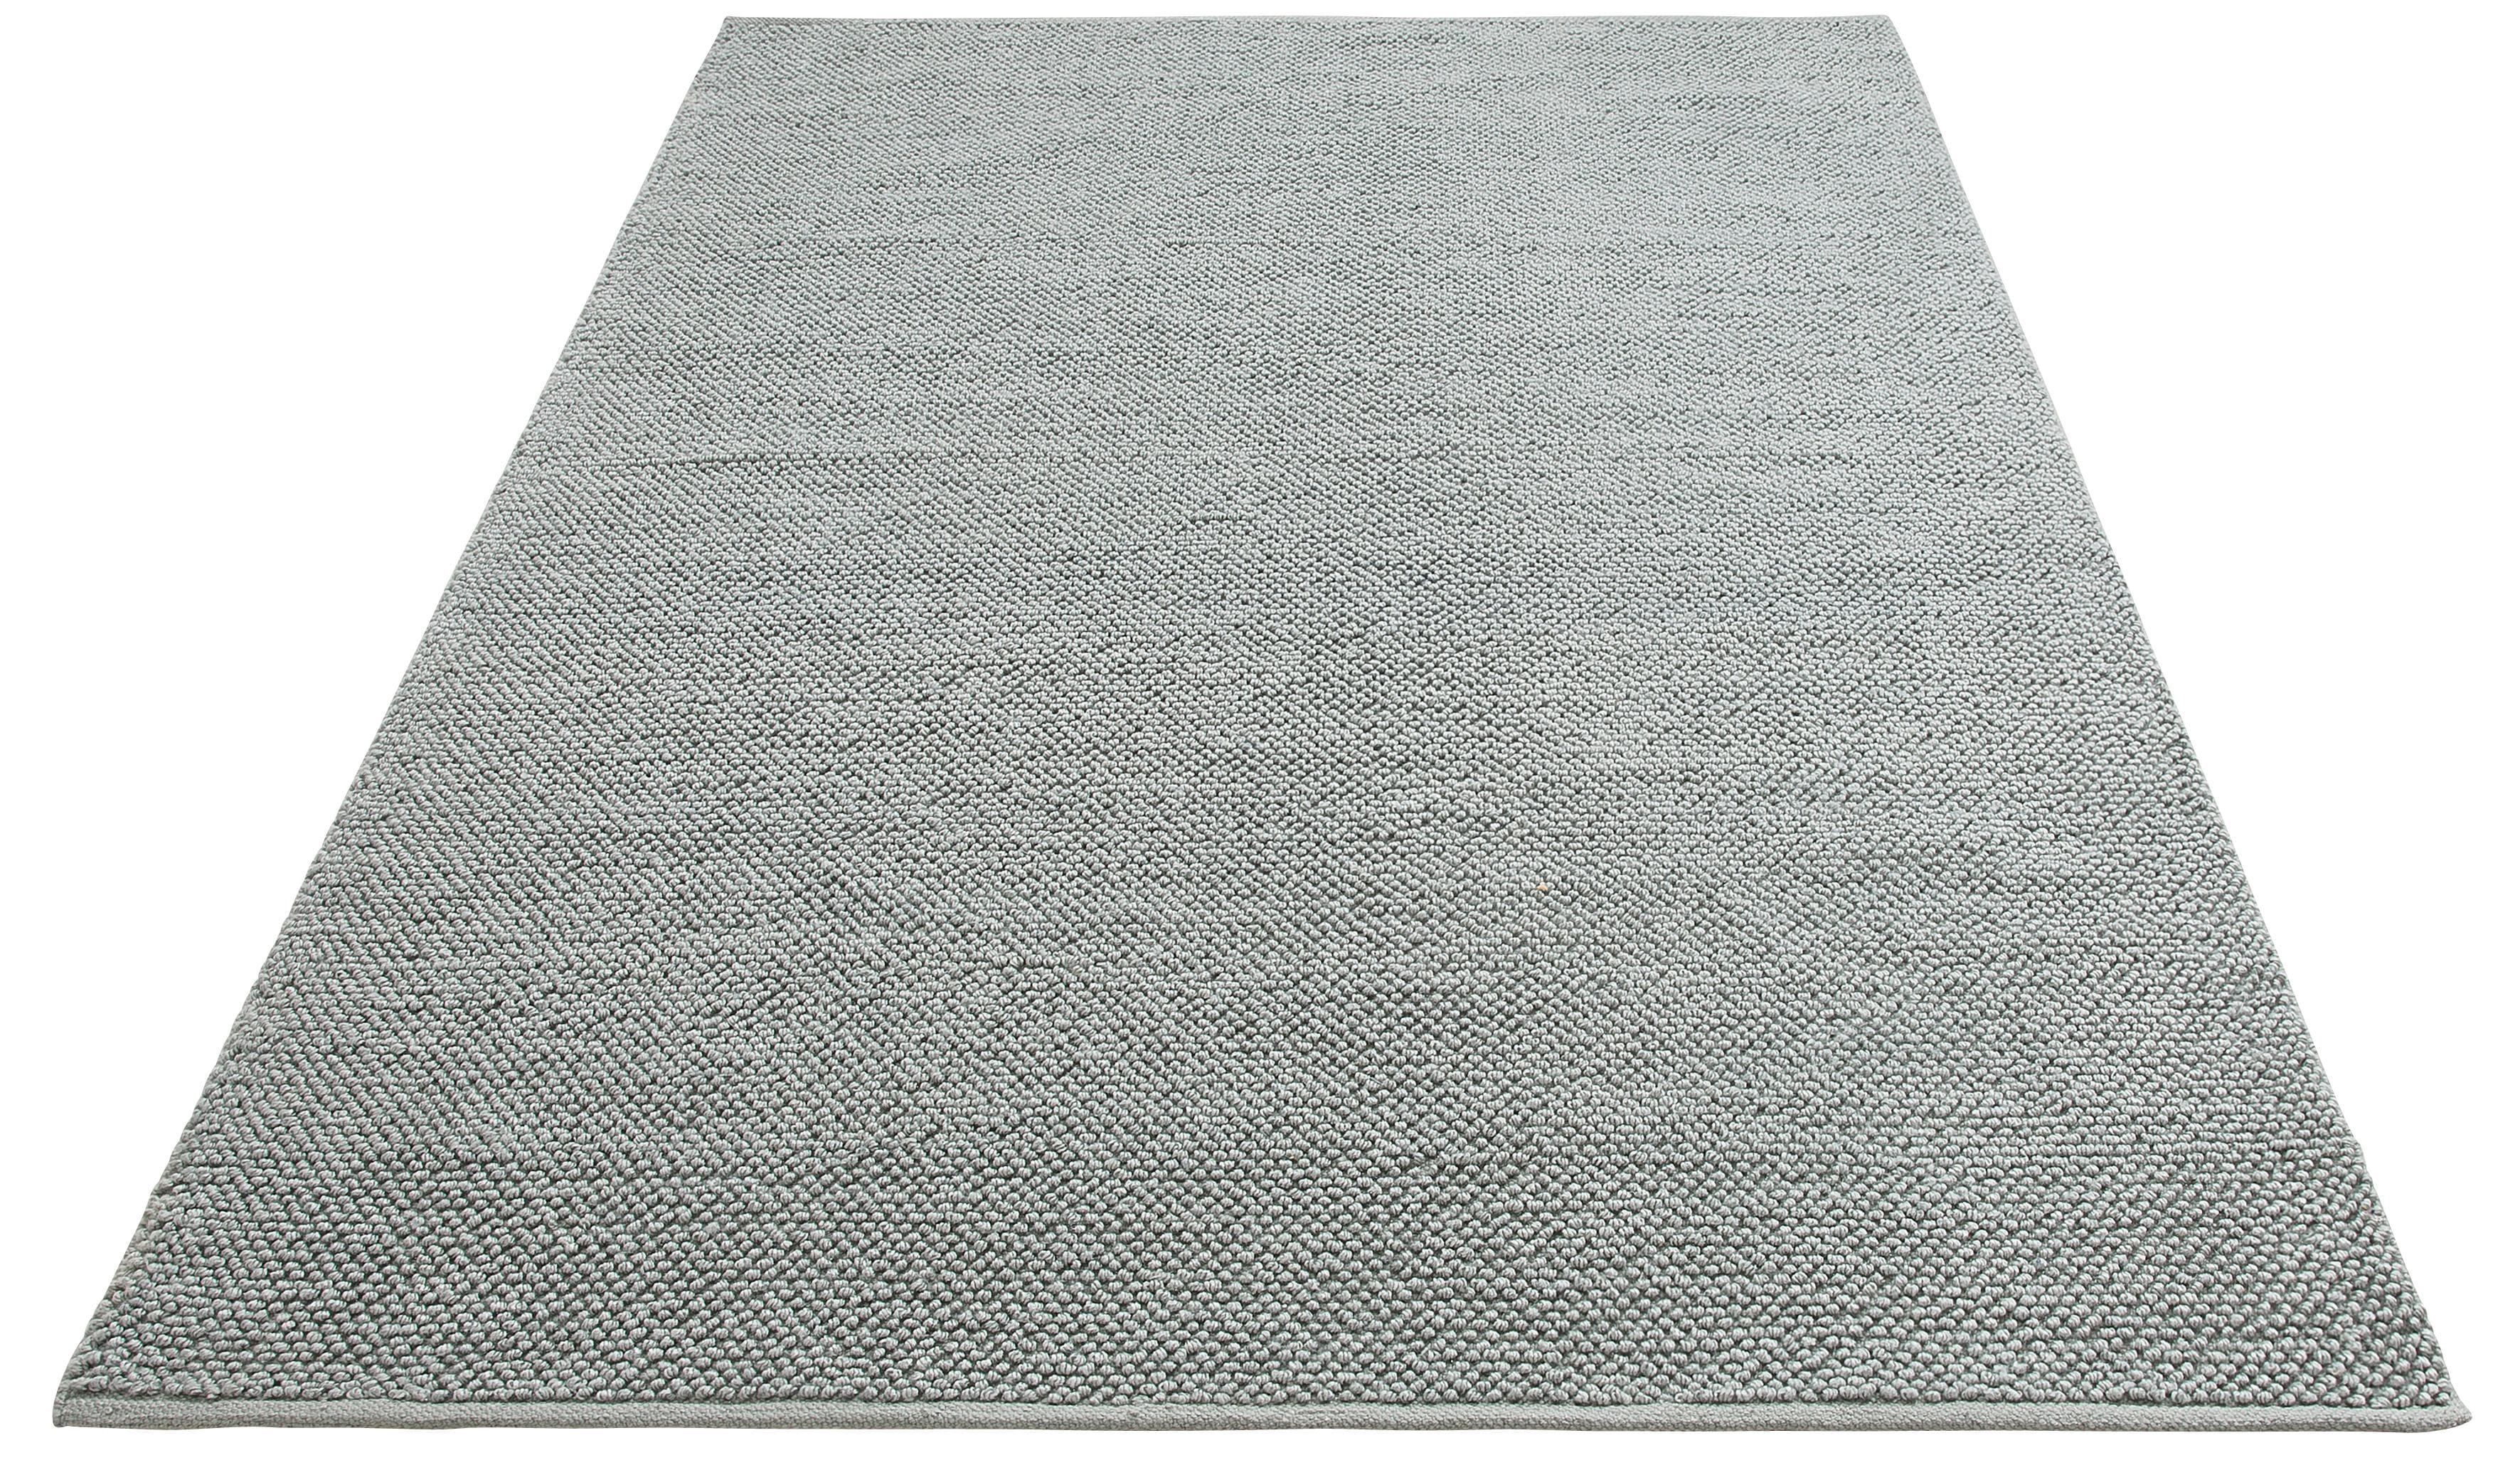 Teppich Thees Home affaire Collection rechteckig Höhe 9 mm handgewebt